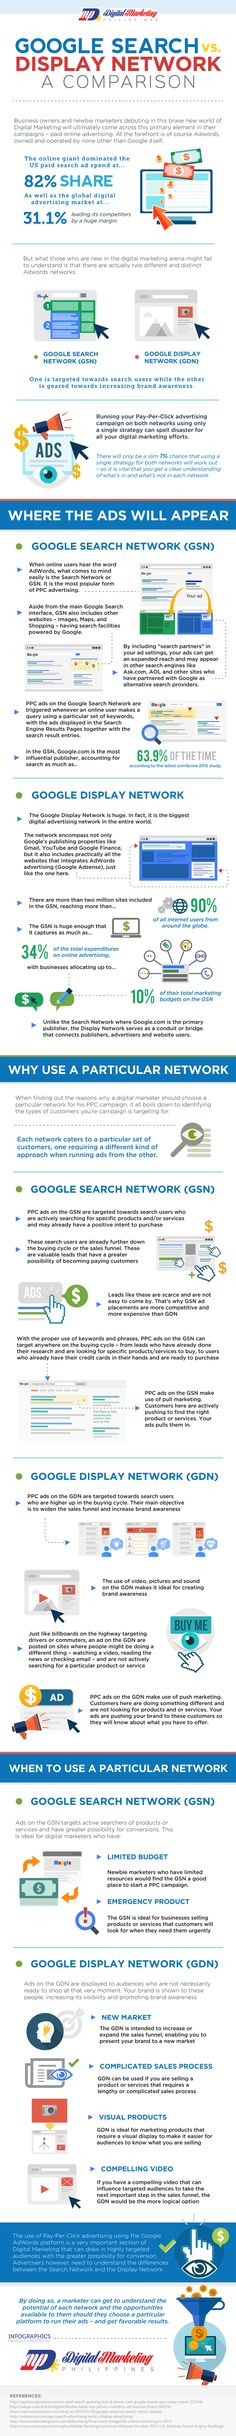 Google Search vs Display Network – A Comparison. #ppc #sem #adwords